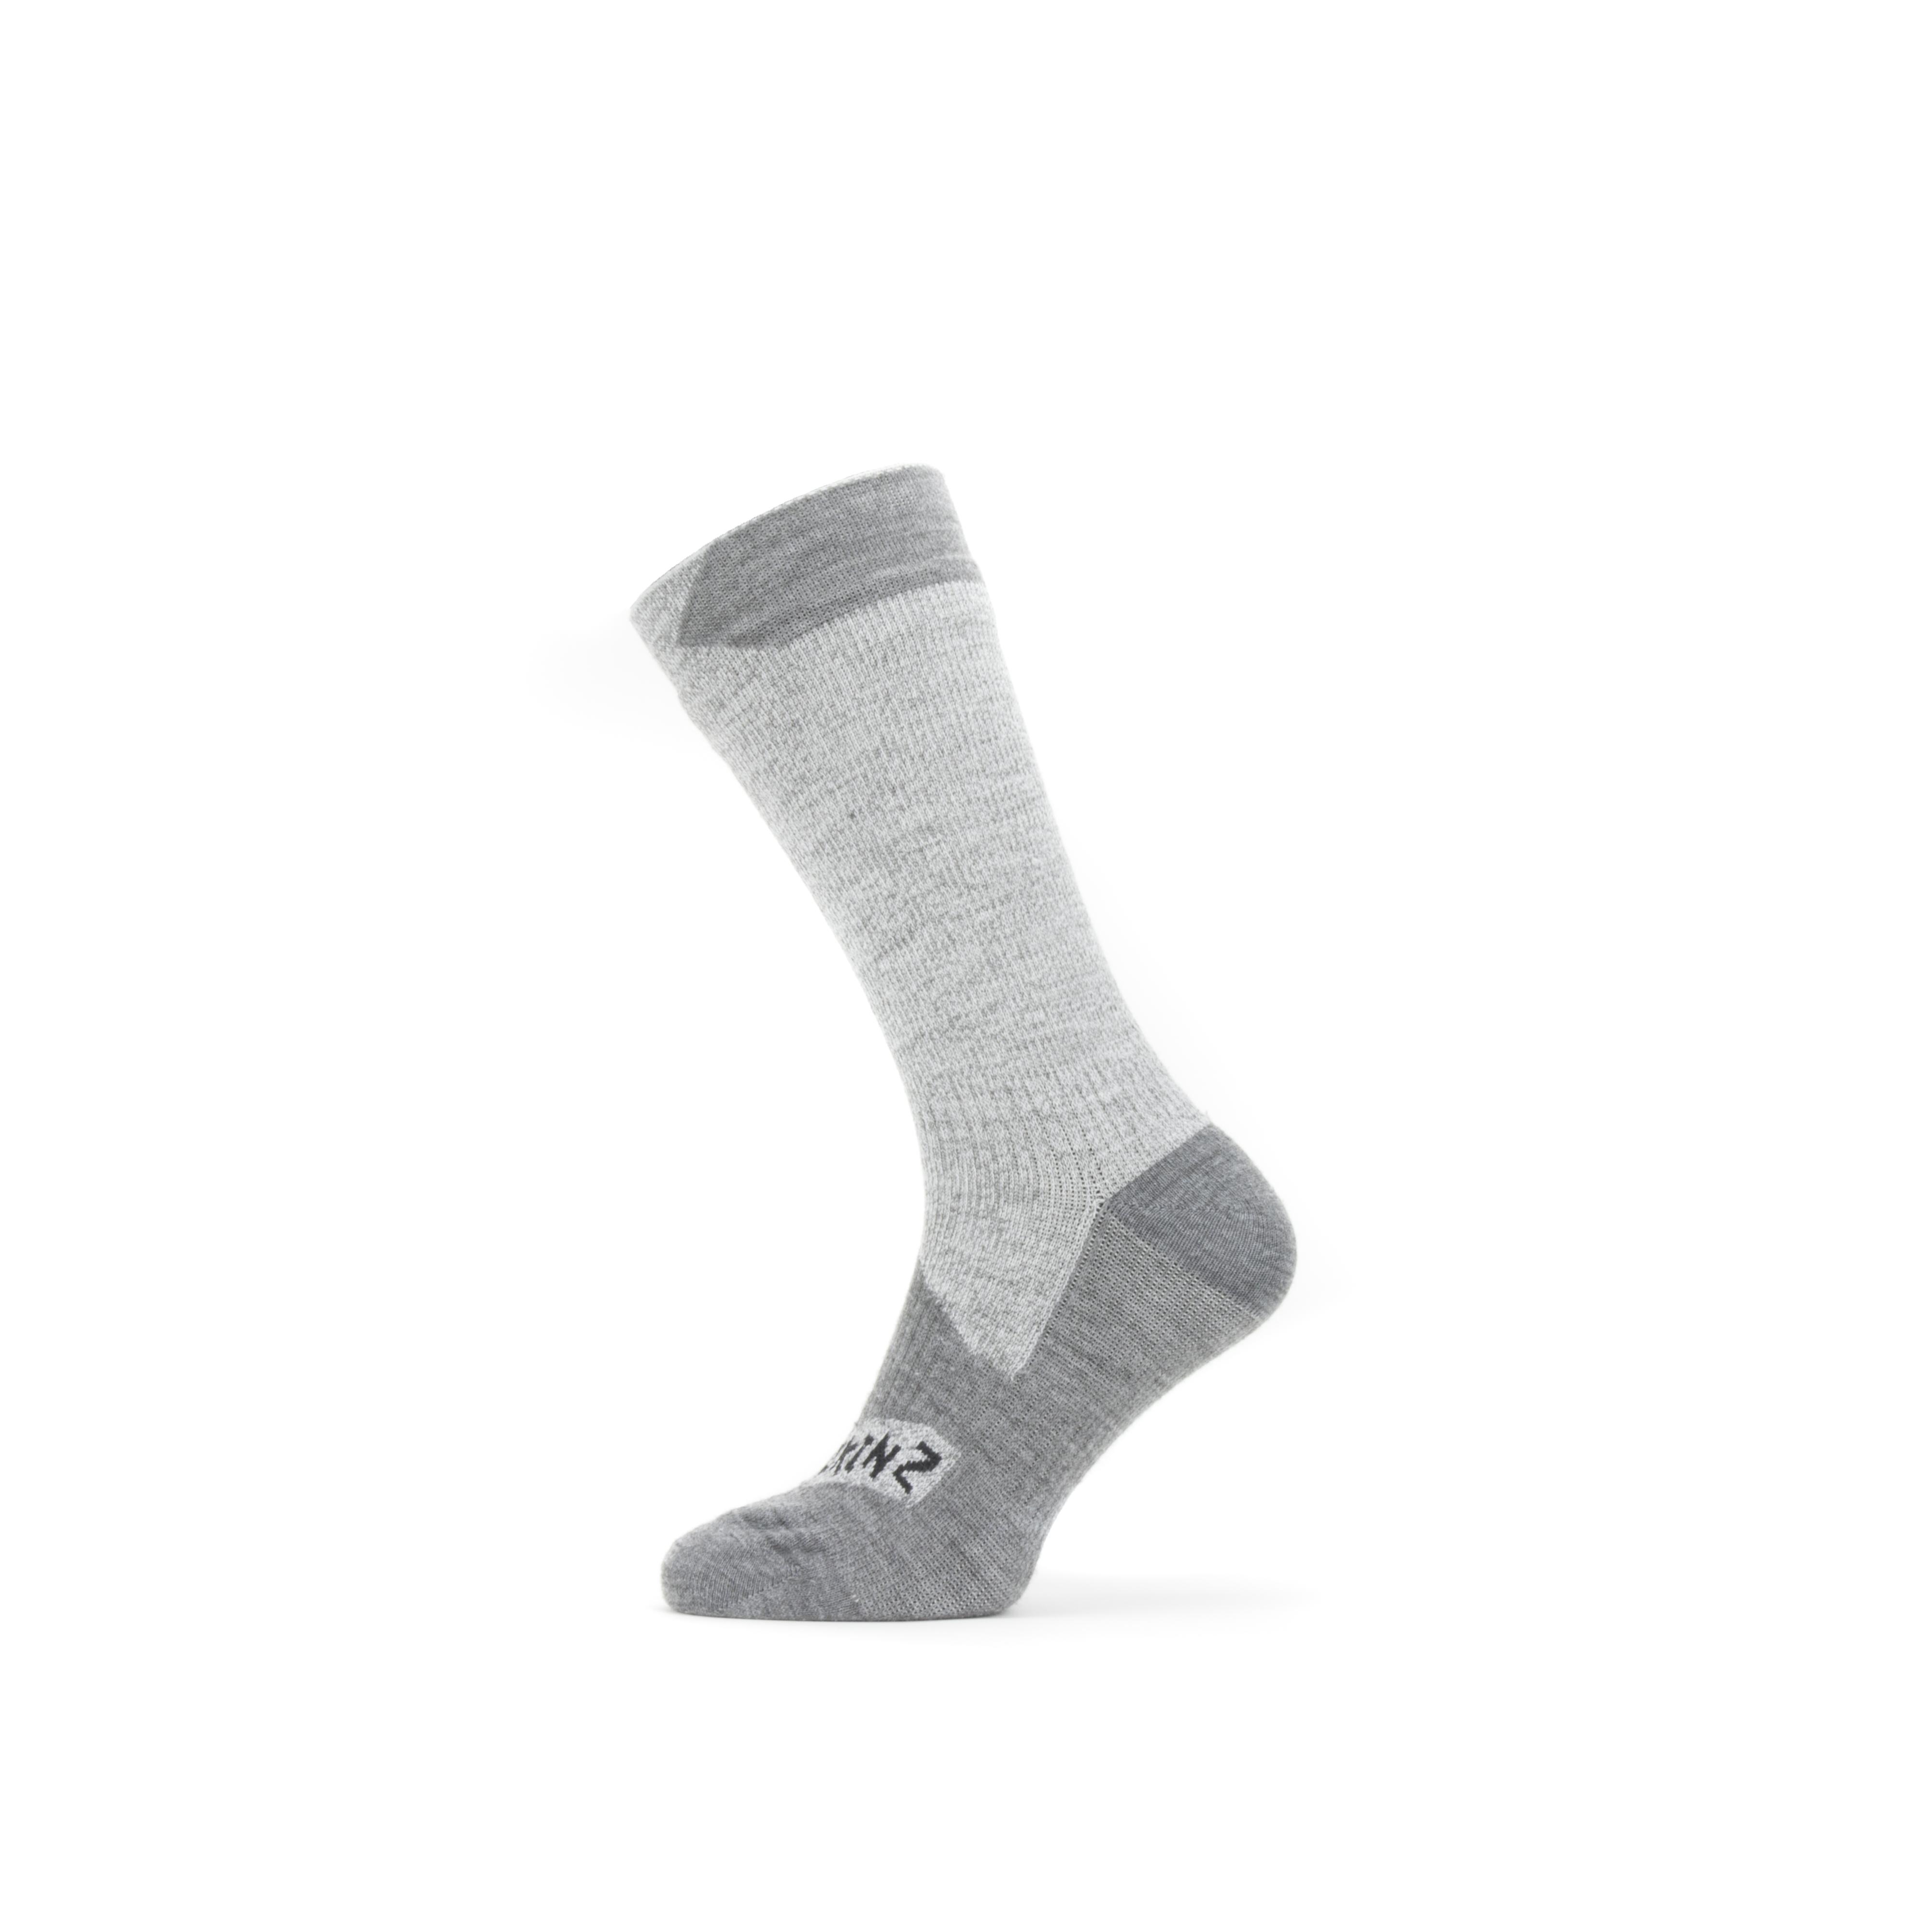 Sealskinz All Weather Mid Length Sock (unisex)